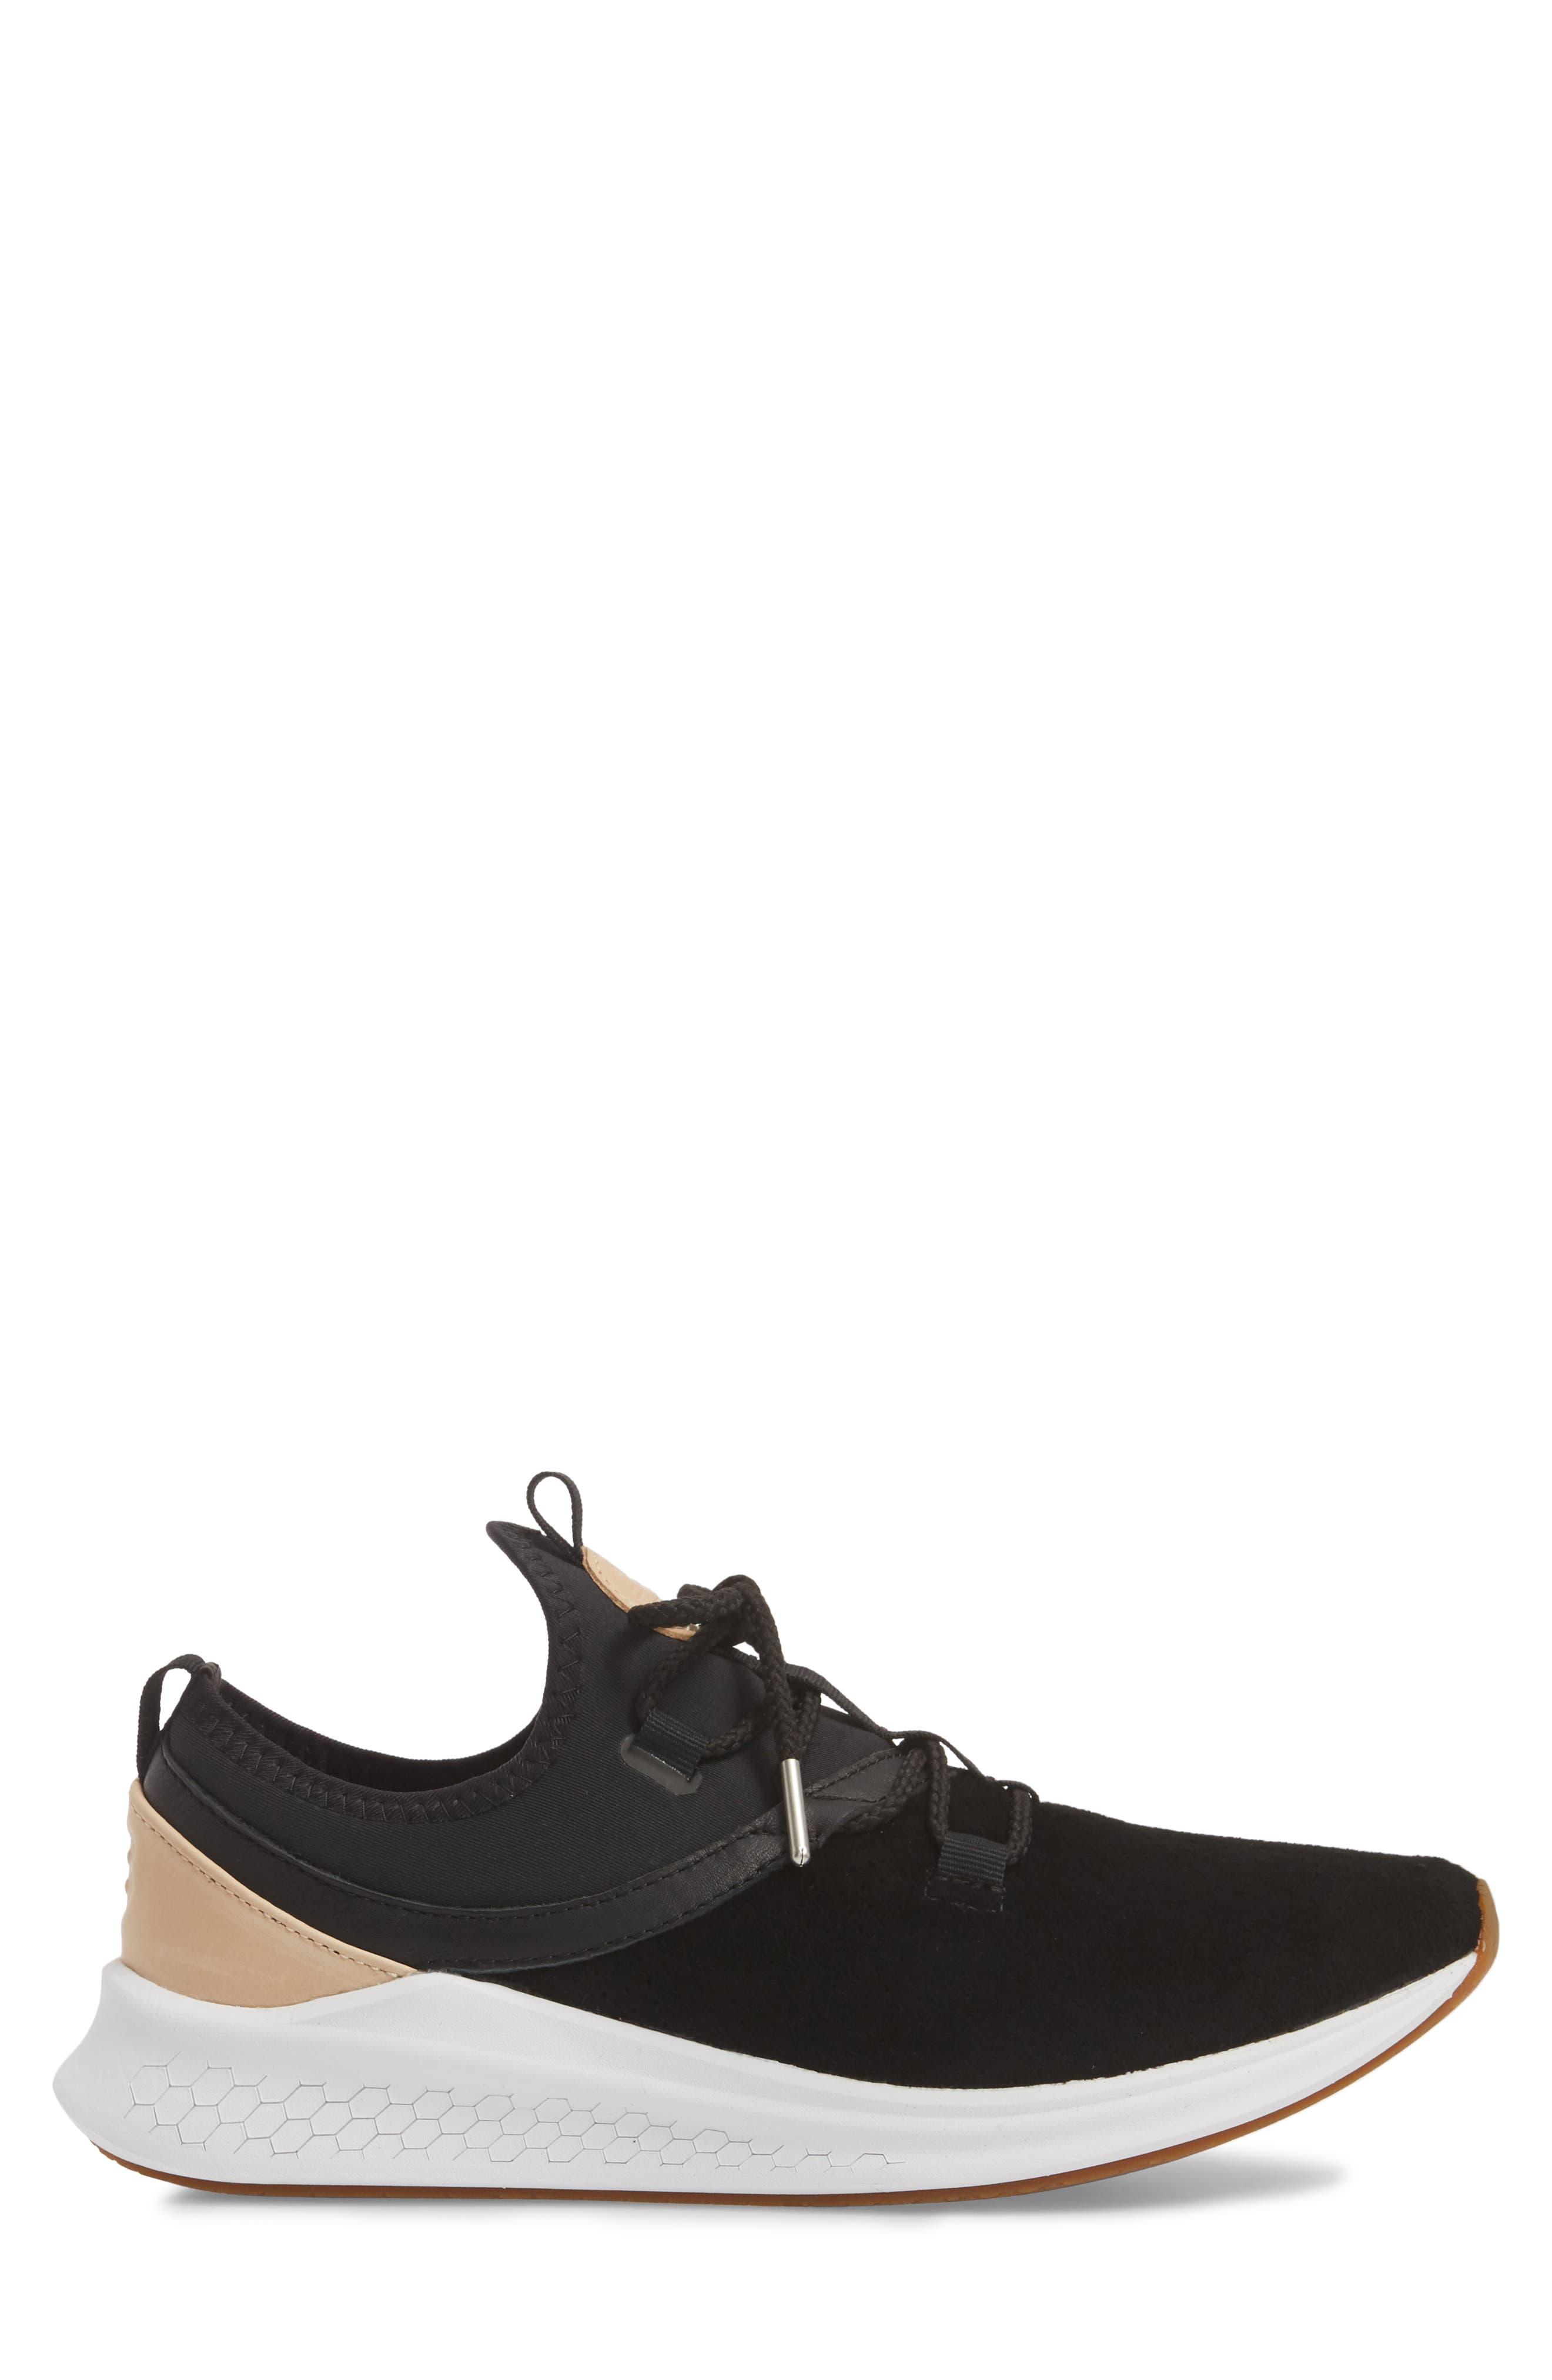 Fresh Foam Lazer Luxe Sneaker,                             Alternate thumbnail 6, color,                             Black